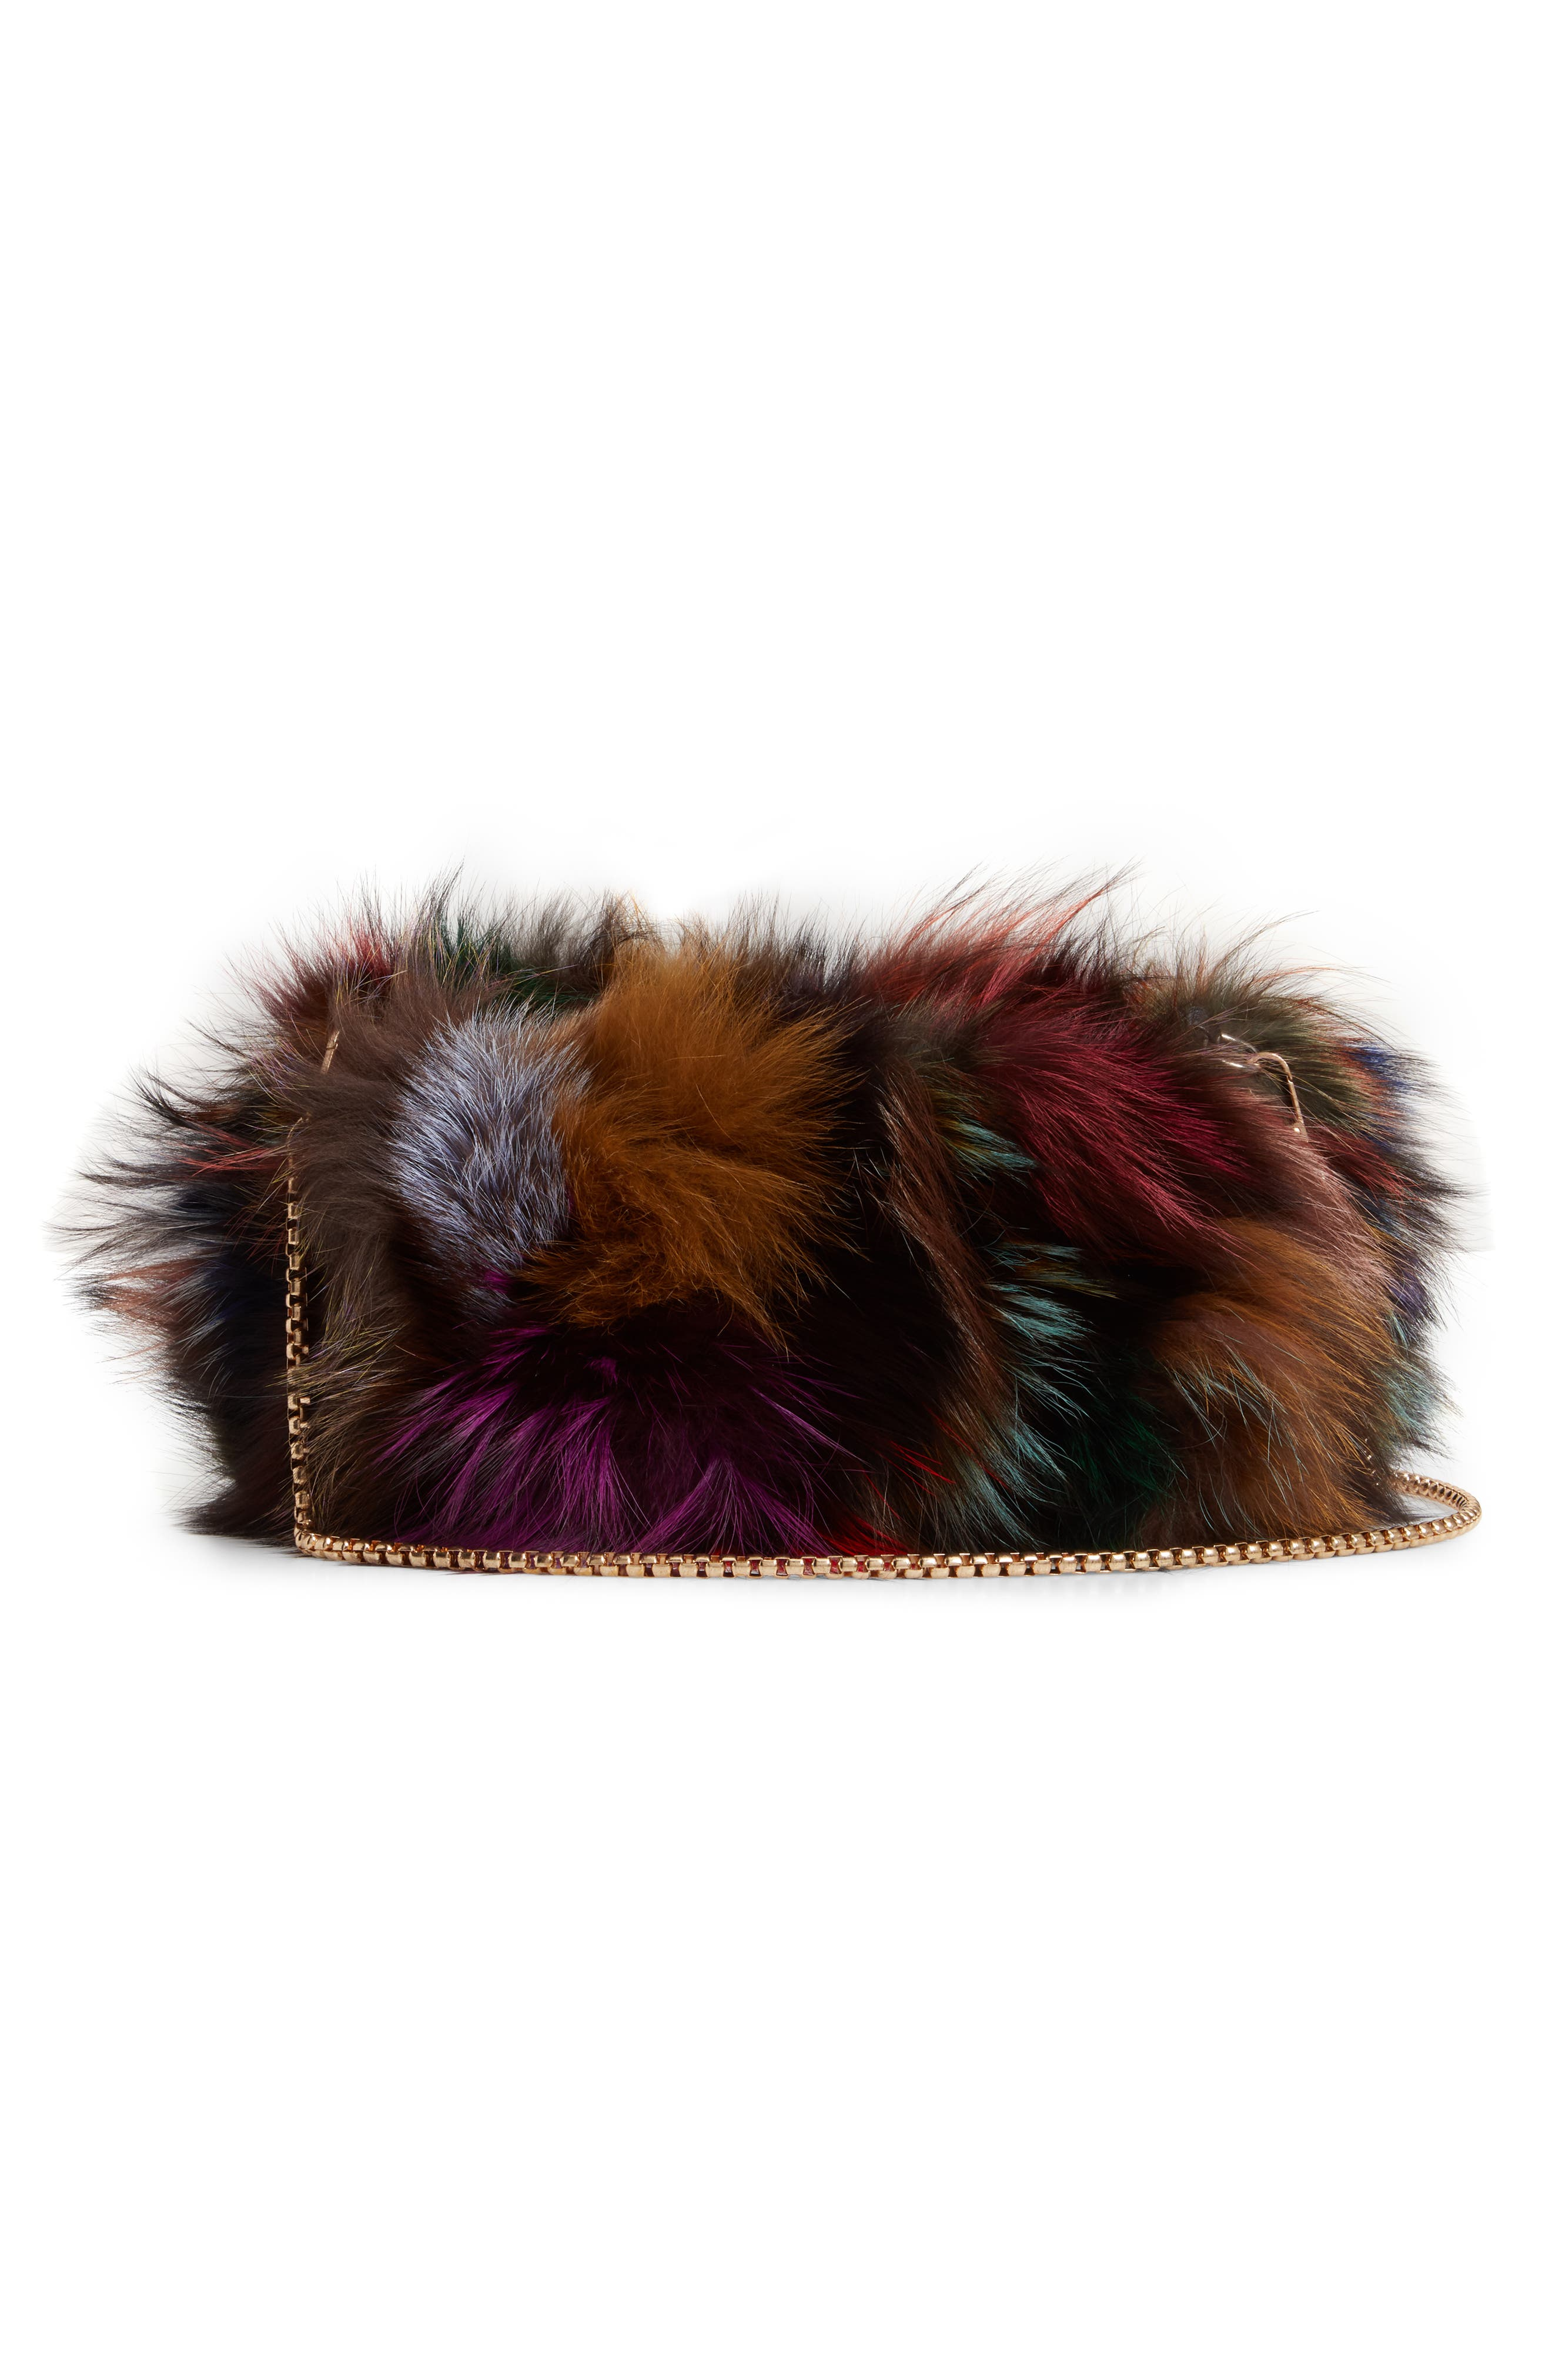 Elmo Genuine Silver Fox Fur Shoulder Bag,                             Alternate thumbnail 4, color,                             BLUE MULTI